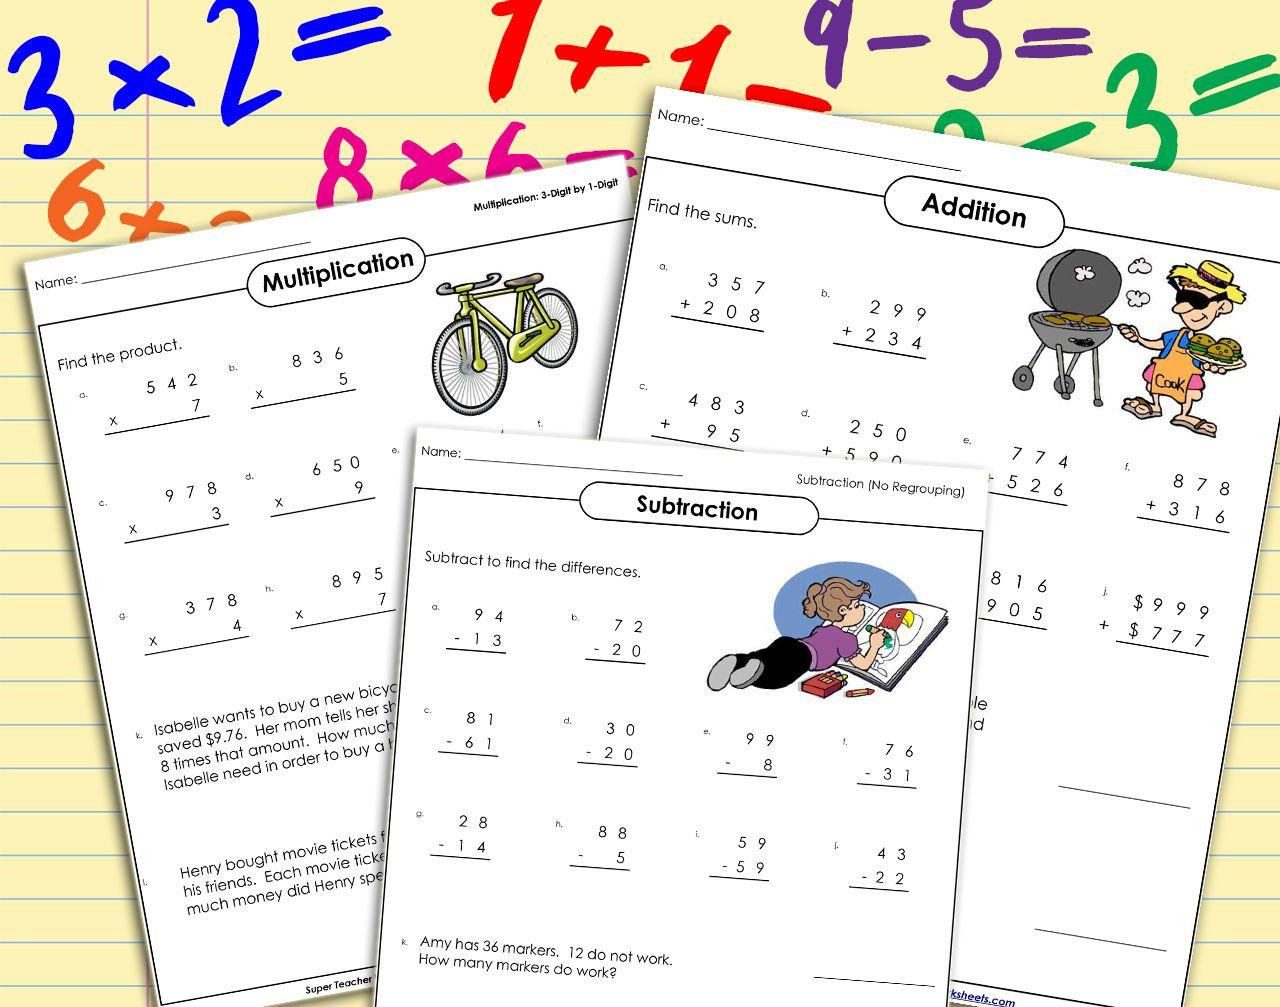 Practice Makes Perfect Reinforce Basic Mathskills With Resources From Superteacherworksheets You Super Teacher Worksheets Math Worksheets Funny Teacher Tee